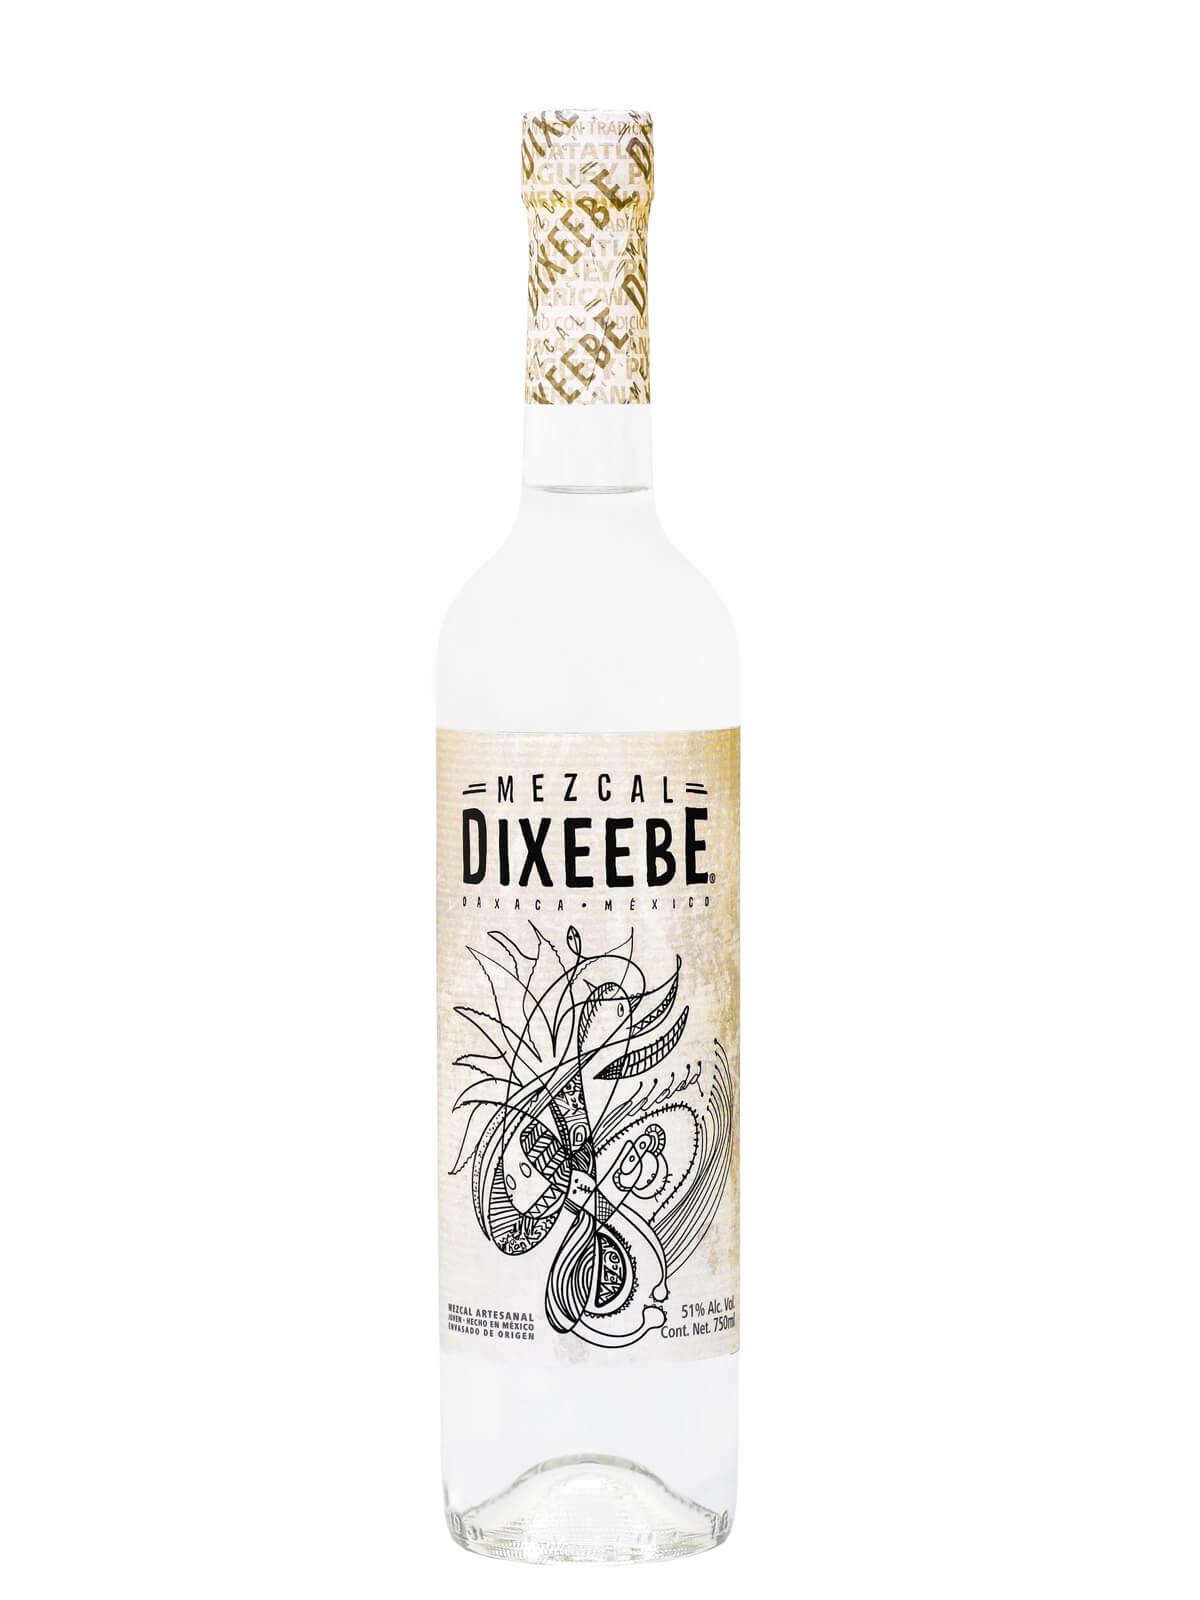 Mezcal Dixeebe Pulquero bottle